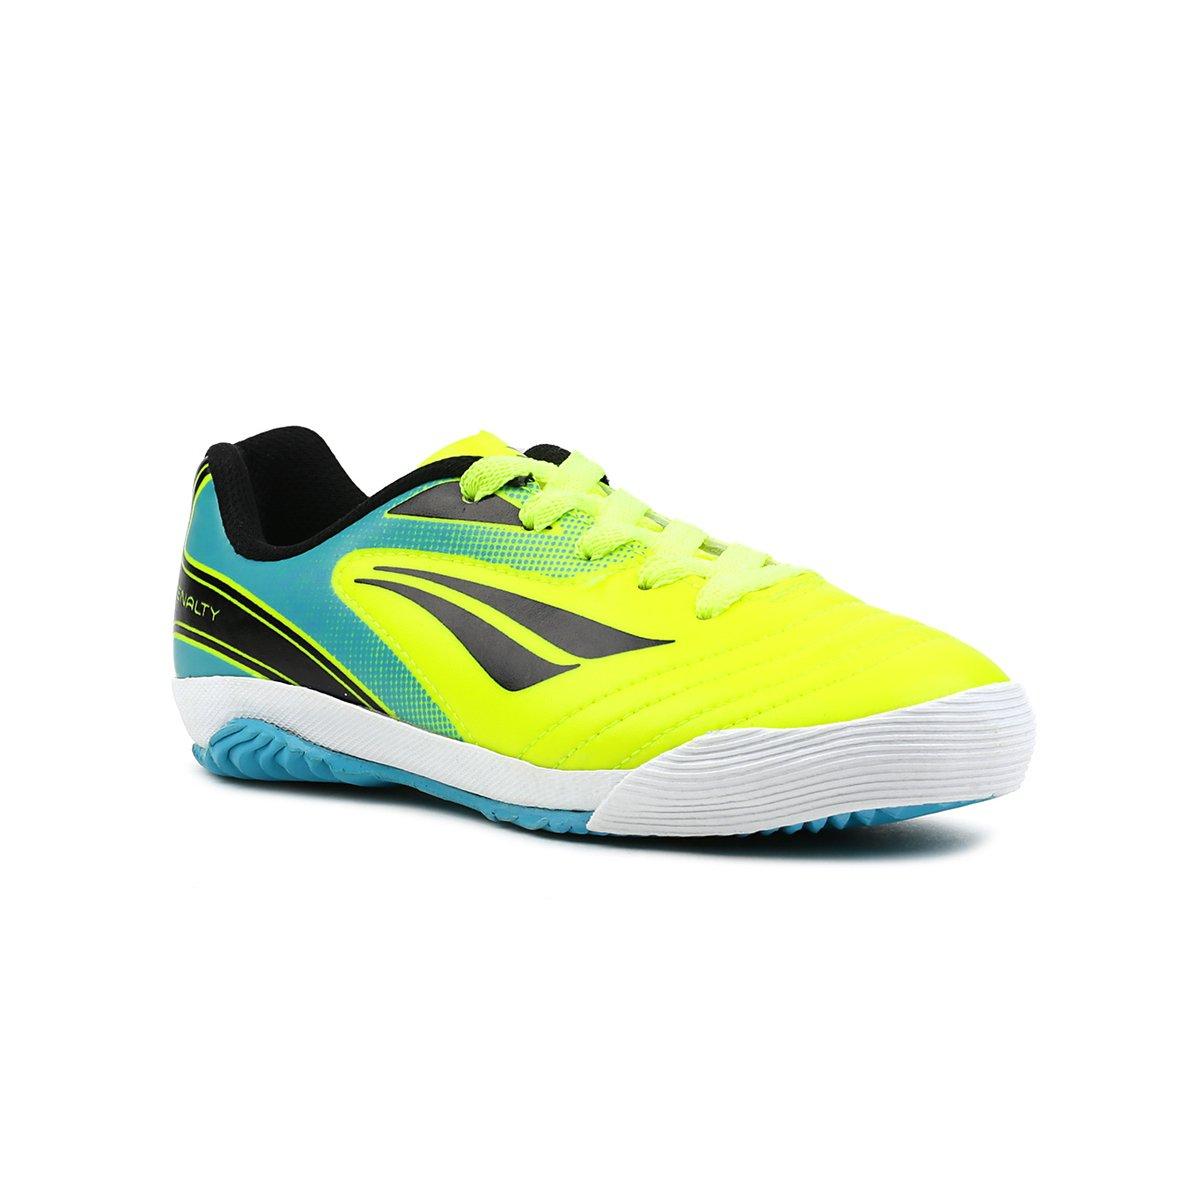 Tênis Futsal Infantil Para Menino Penalty Atf K Rocket V Amarelo - Compre  Agora  231ee87fe1dca